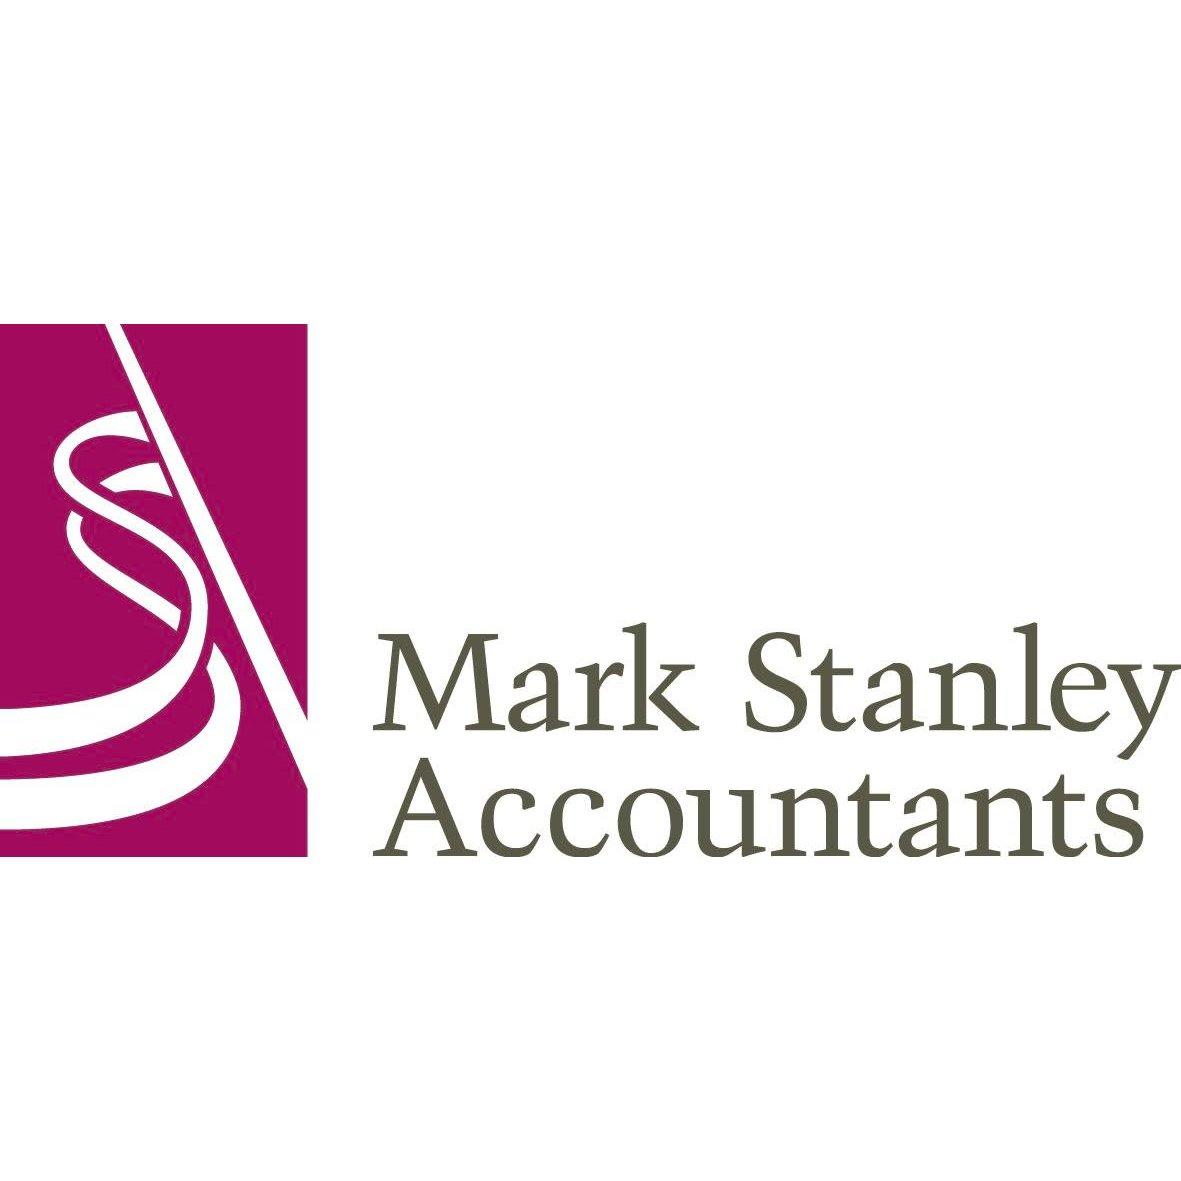 Mark Stanley Accountants Ltd - Consett, Durham DH8 7UG - 01207 582528 | ShowMeLocal.com